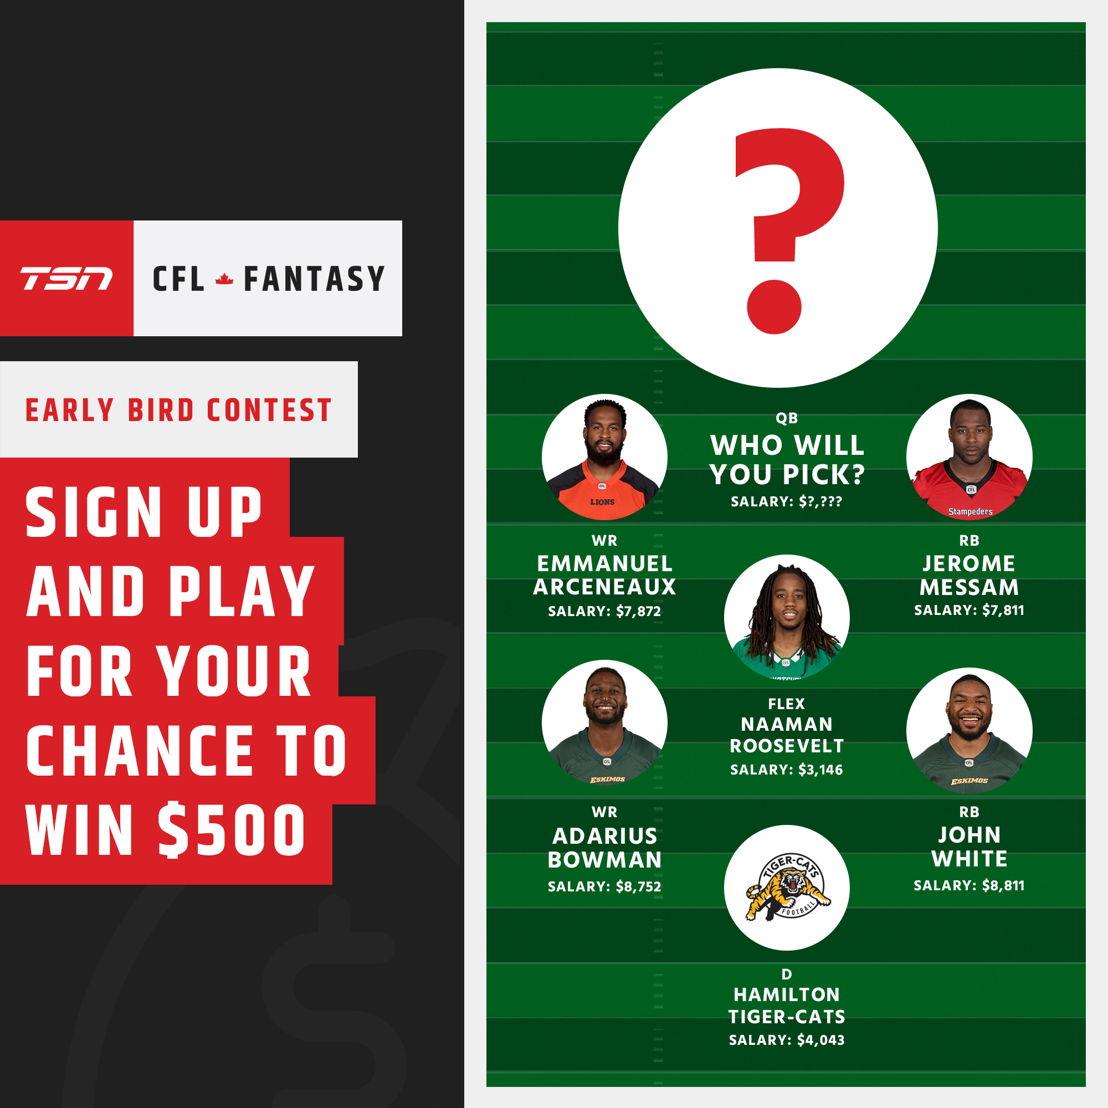 Work within the cap and win big - play now at CFLFantasy.TSN.ca